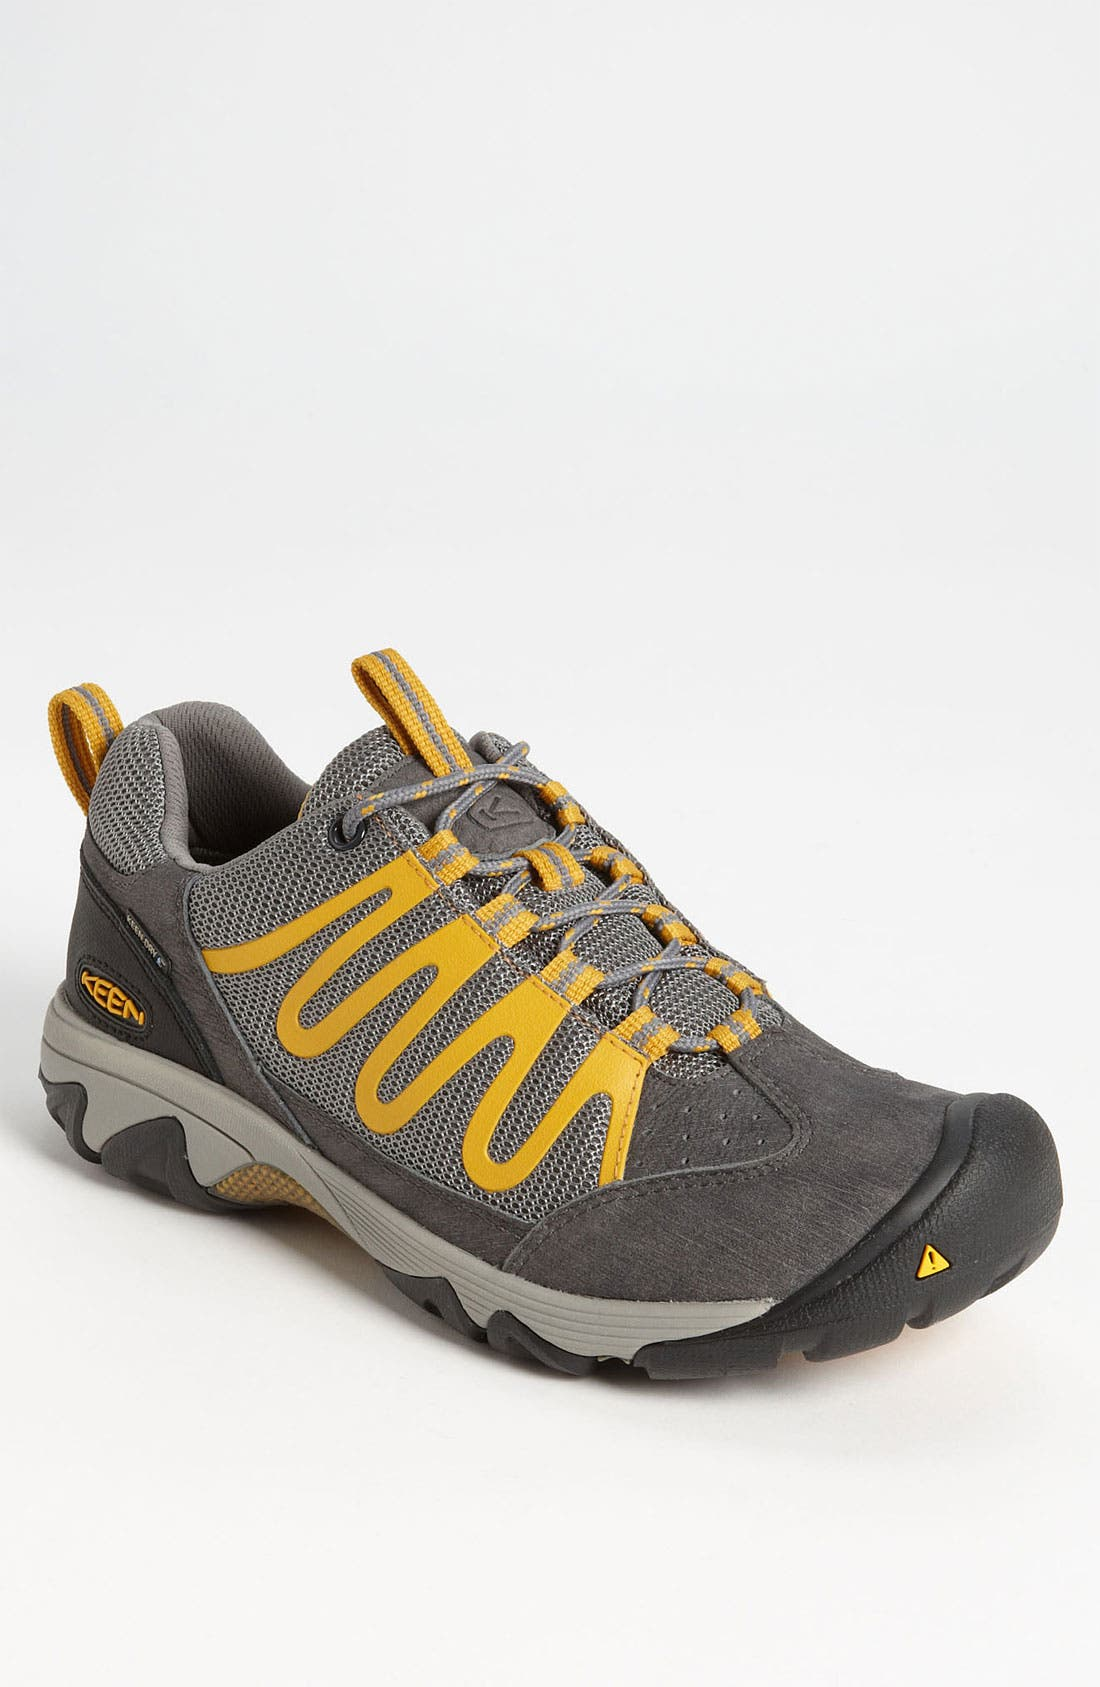 Main Image - Keen 'Verdi WP' Hiking Shoe (Men)